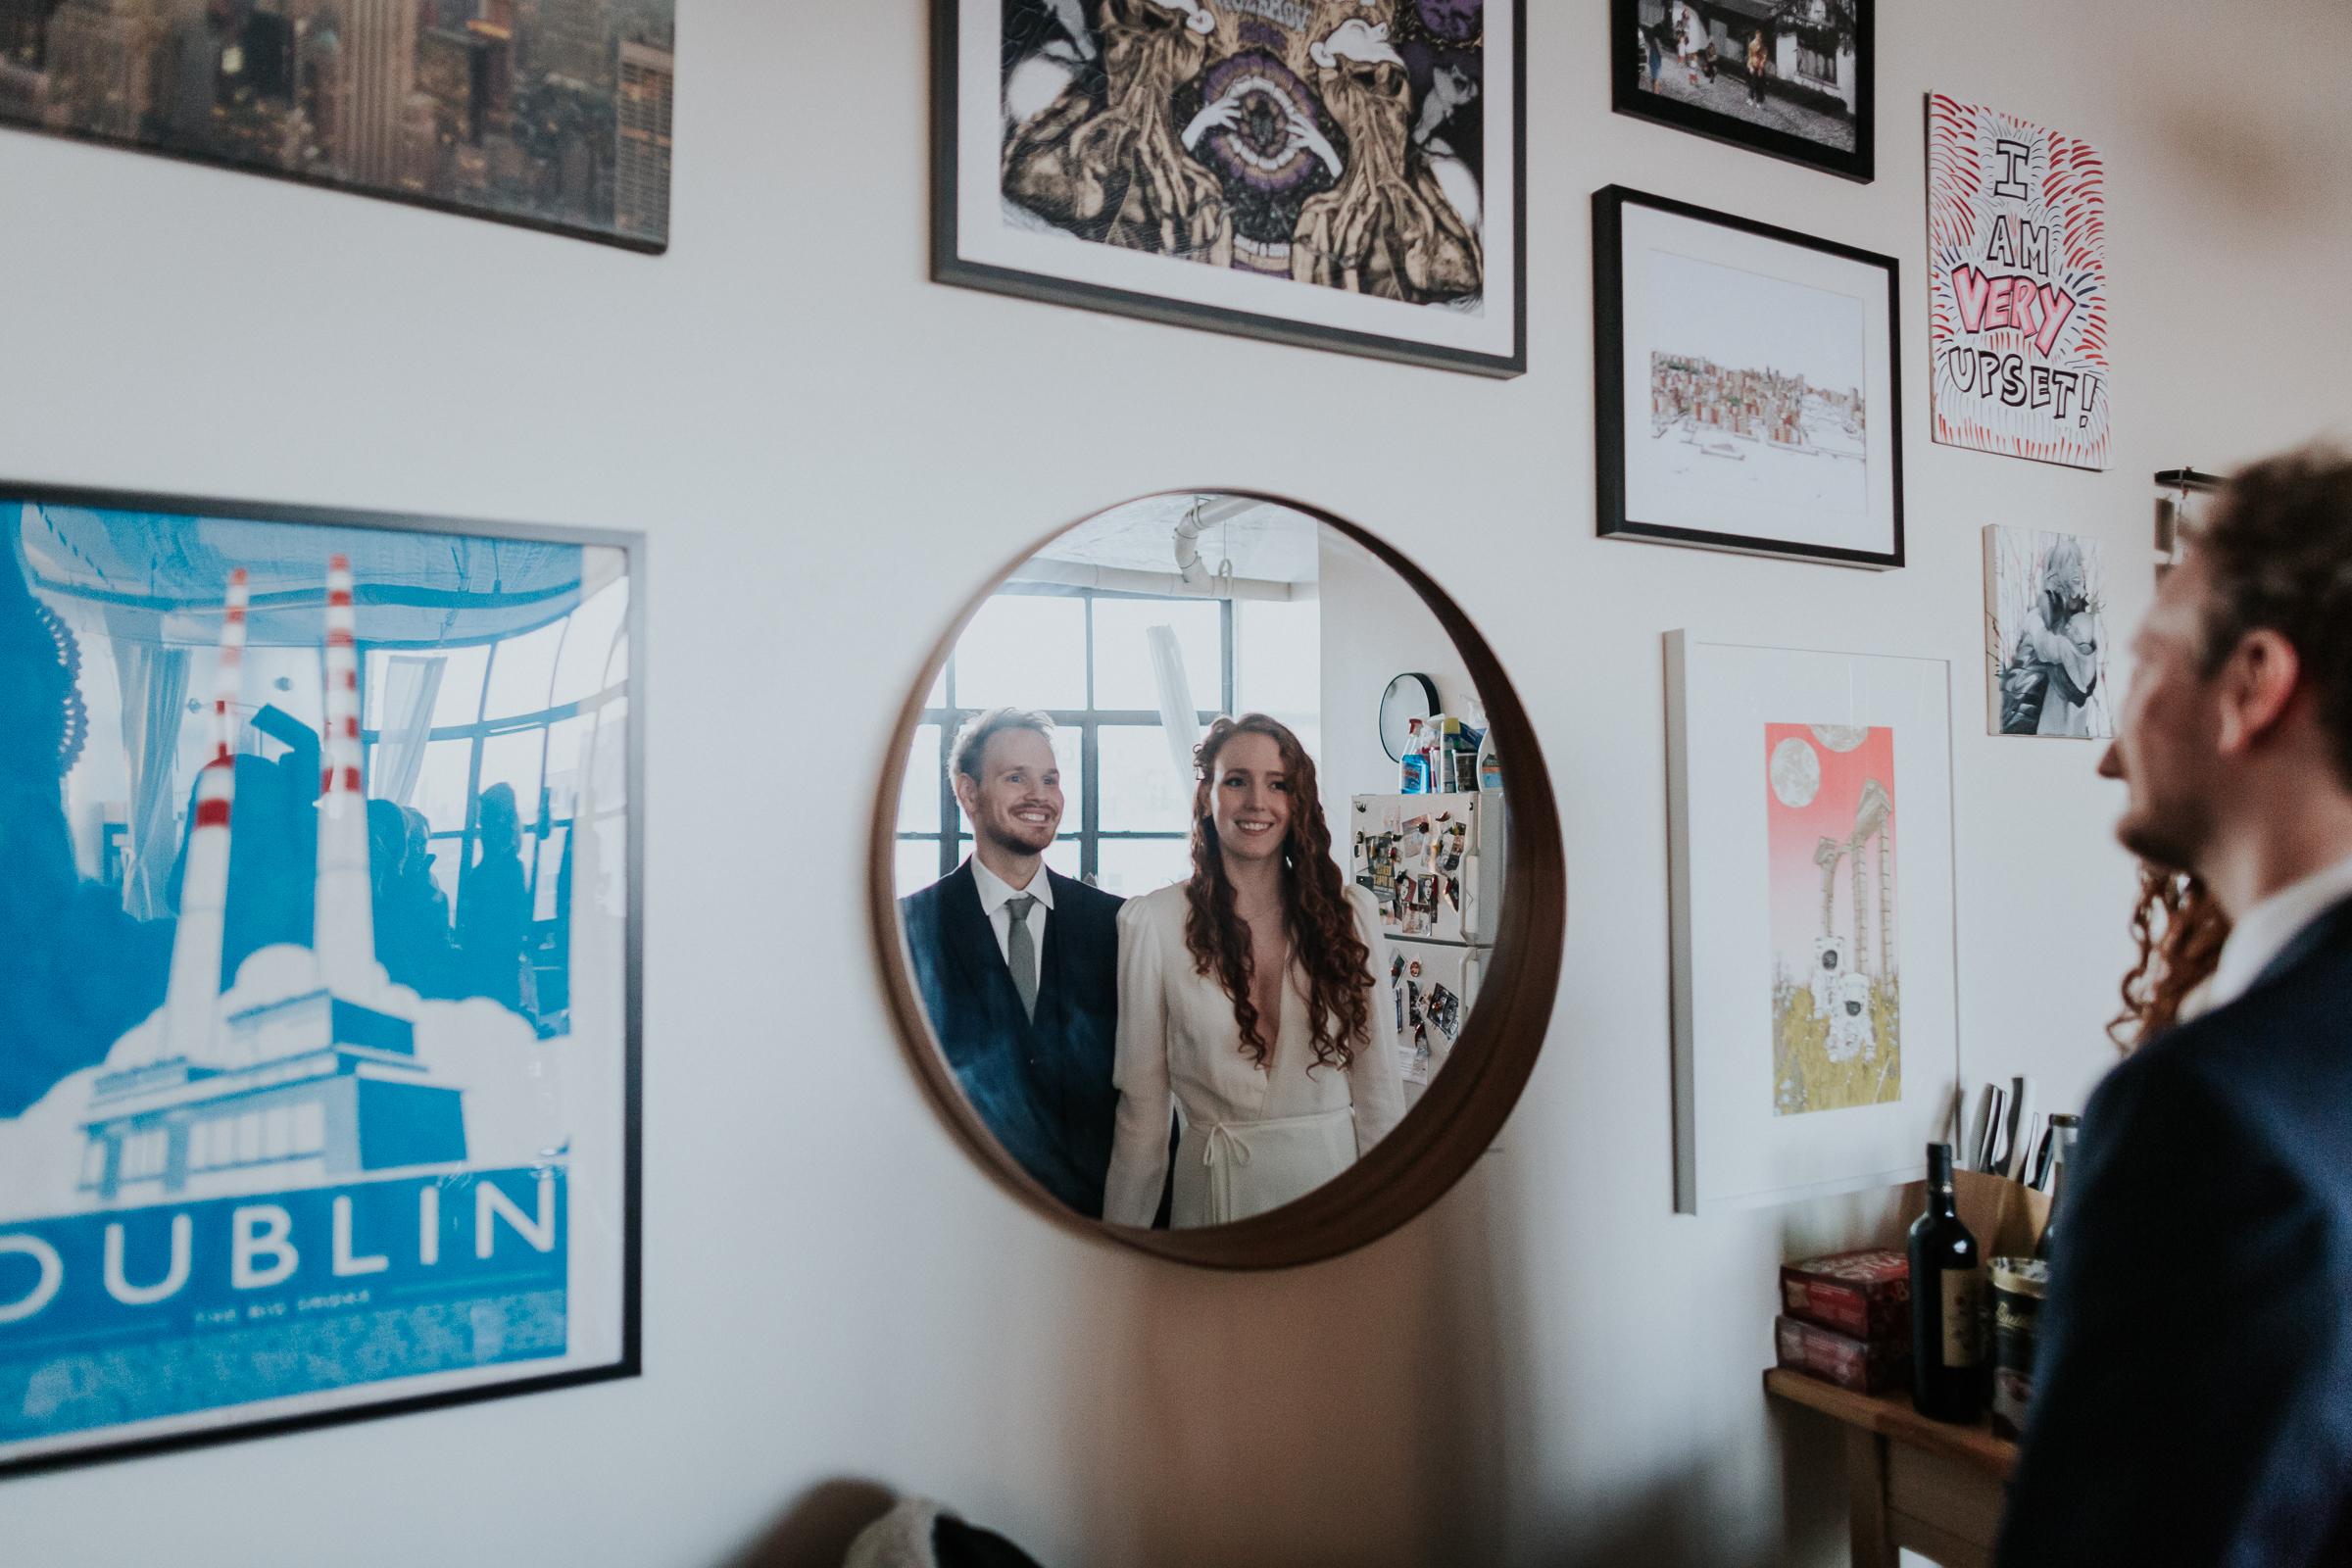 Freemans-Restaurant-Soho-Brooklyn-Bridge-Park-Dumbo-Documentary-Wedding-Photographer-26.jpg